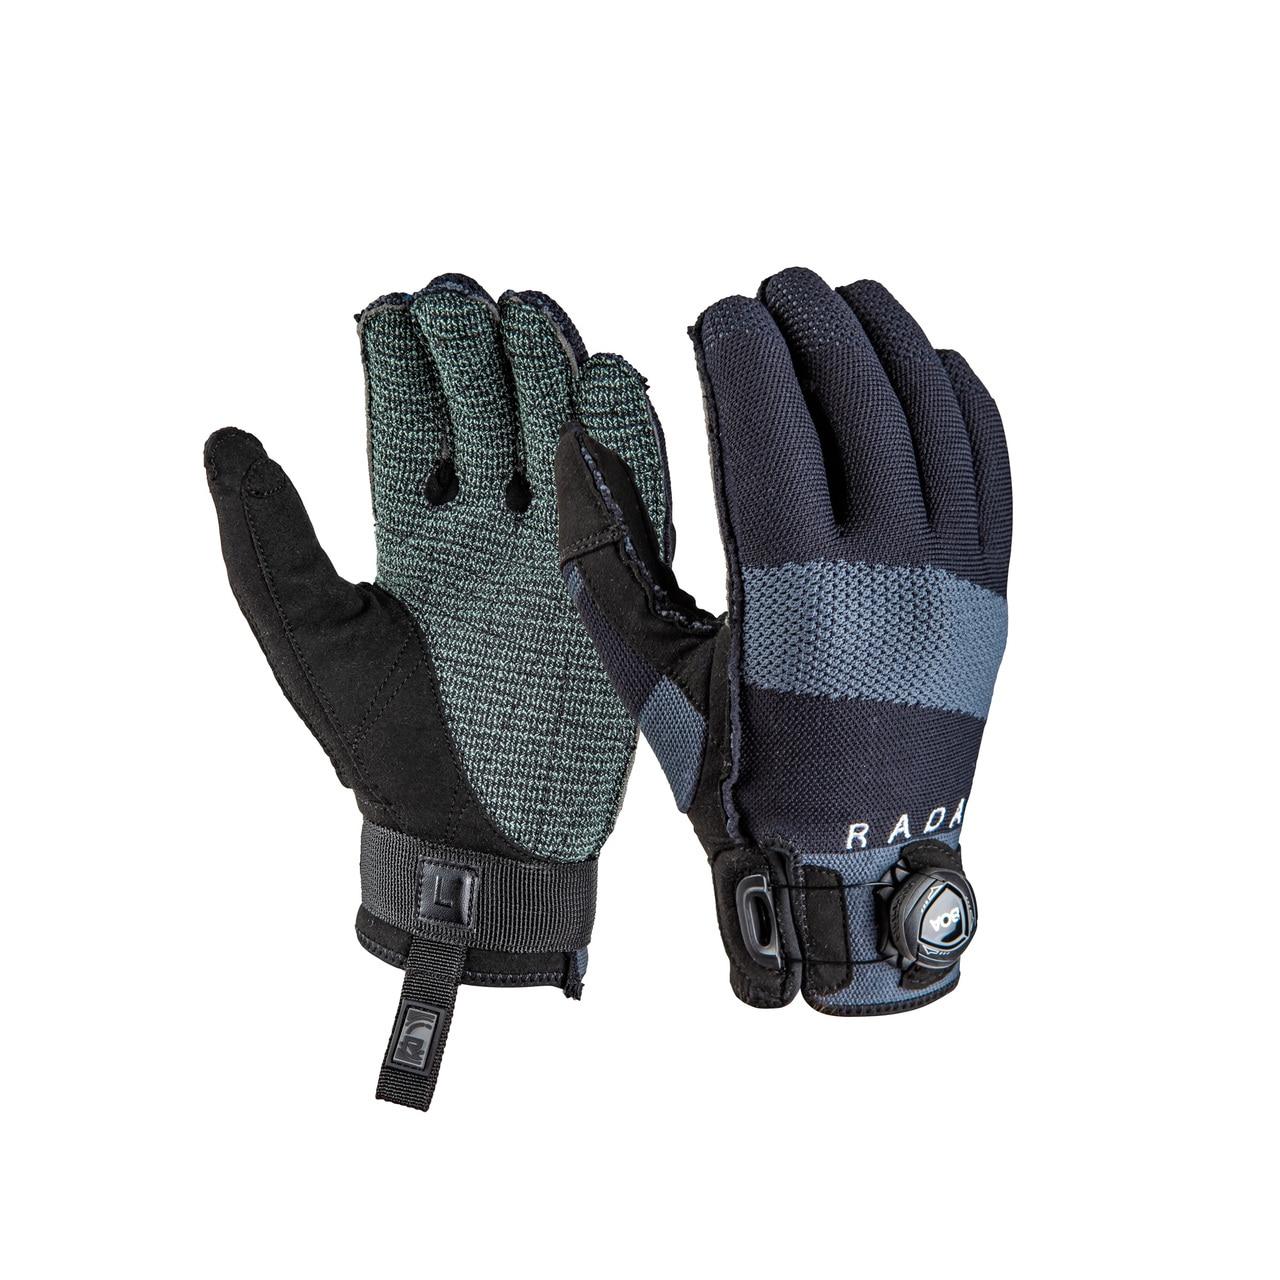 RADAR Engineer BOA Inside-Out Black/Gray Gloves (215002-par)